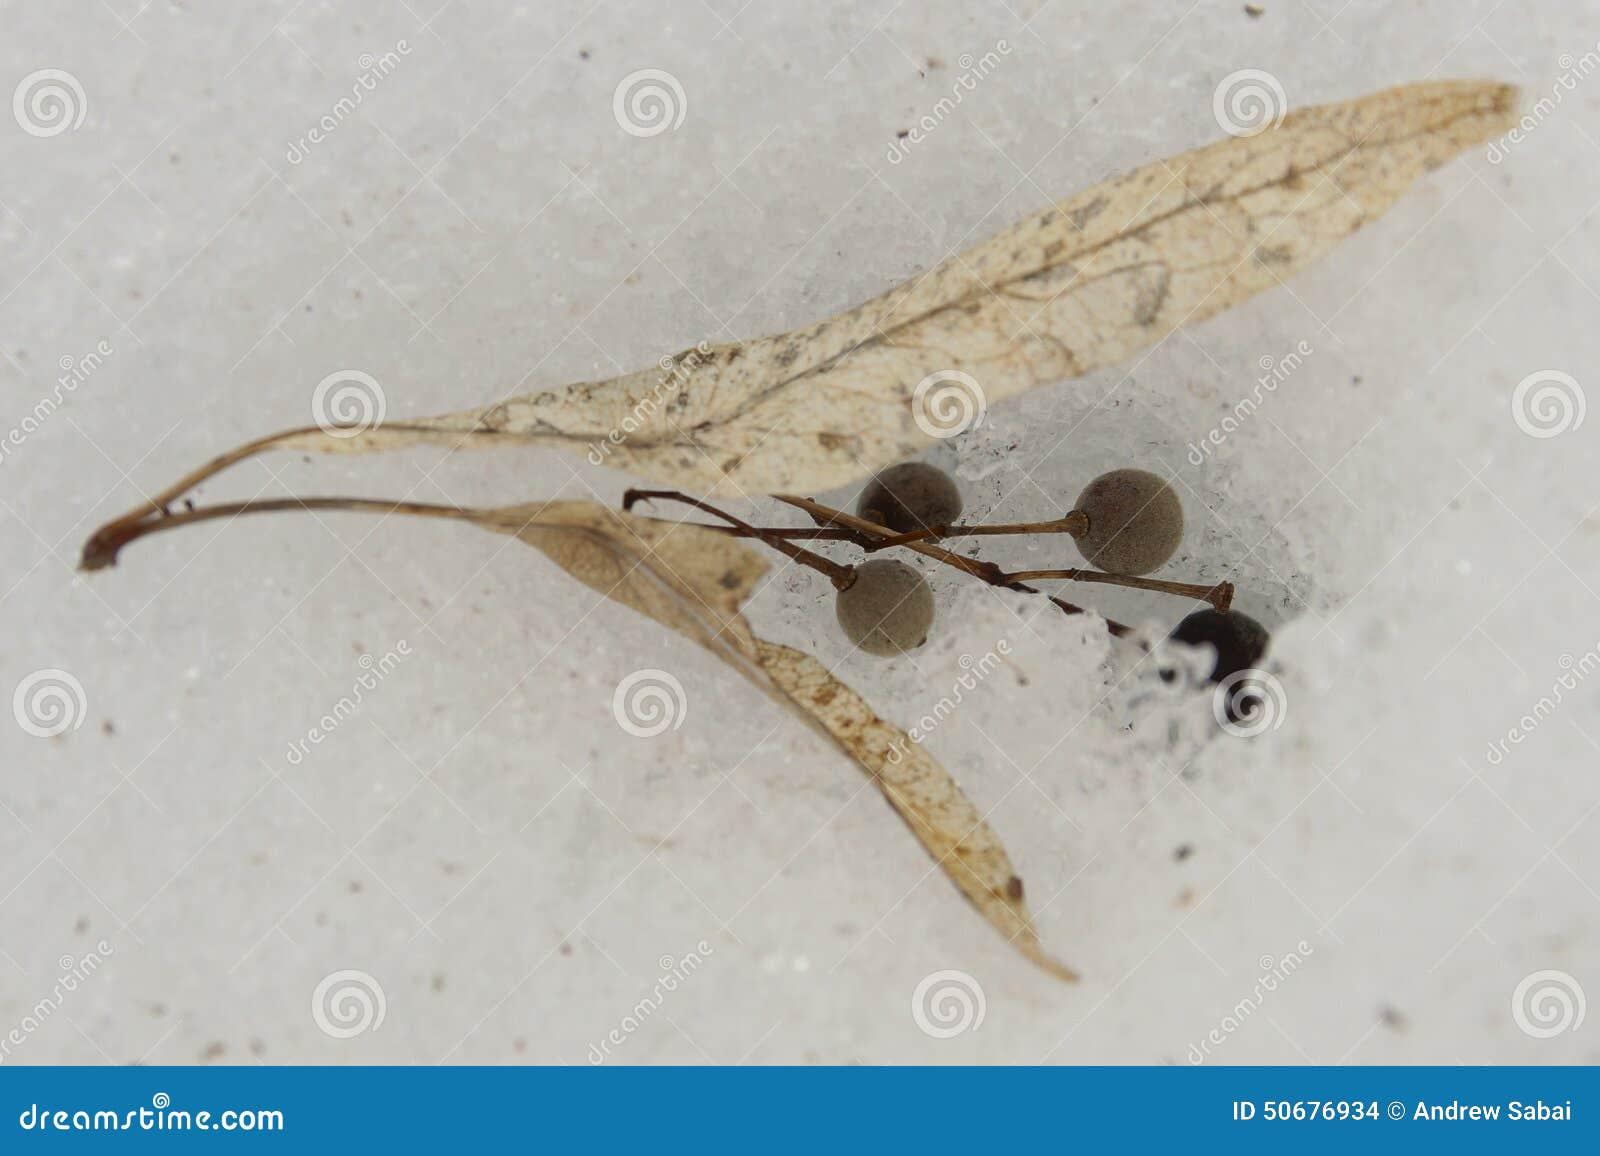 Download 美国美国鹅掌楸(美国的椴树属)种子 库存照片. 图片 包括有 本质, browne, 冬天, 大使职位, 种子 - 50676934